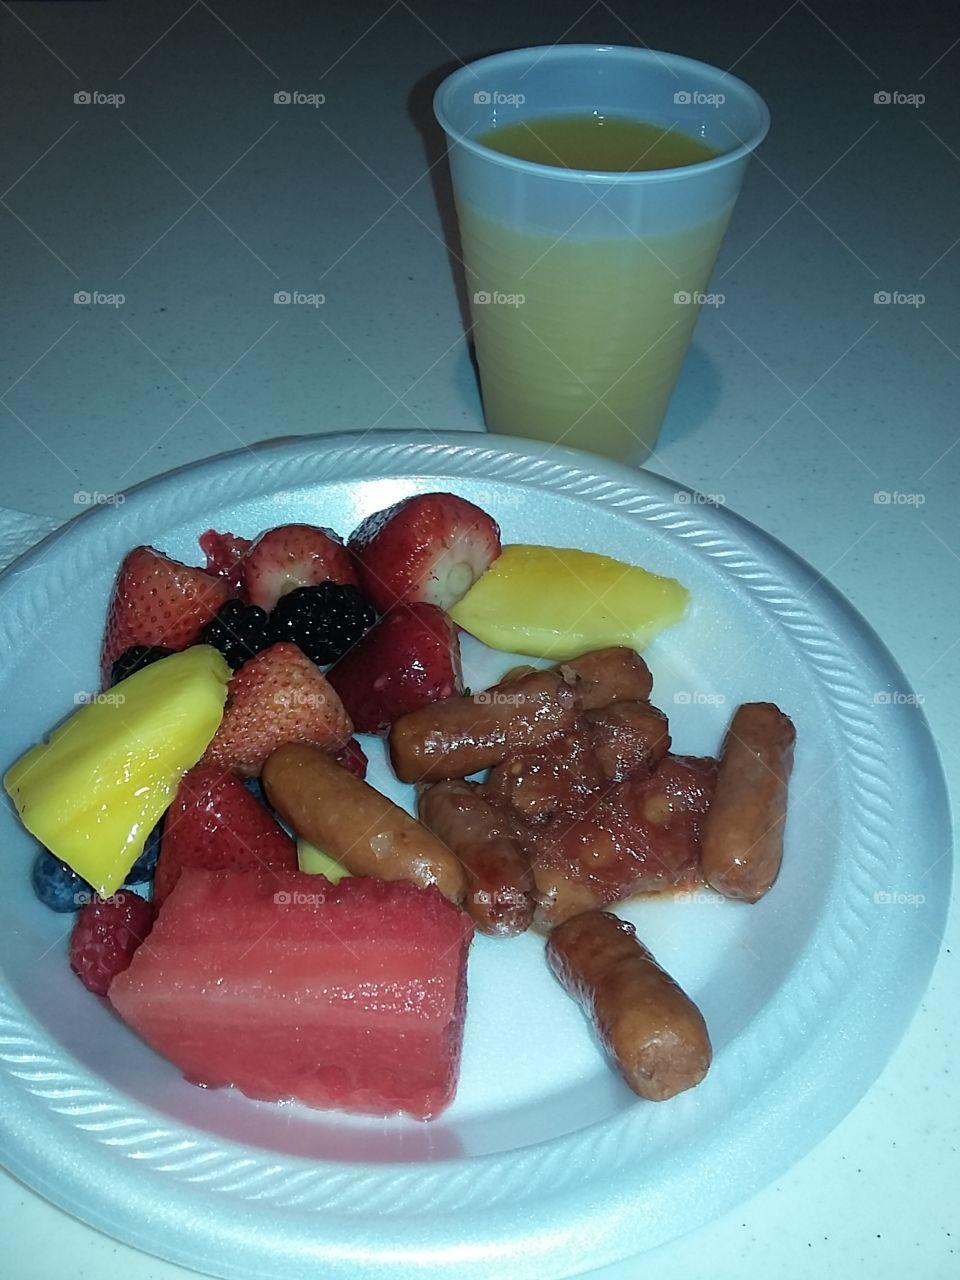 Church breakfast.